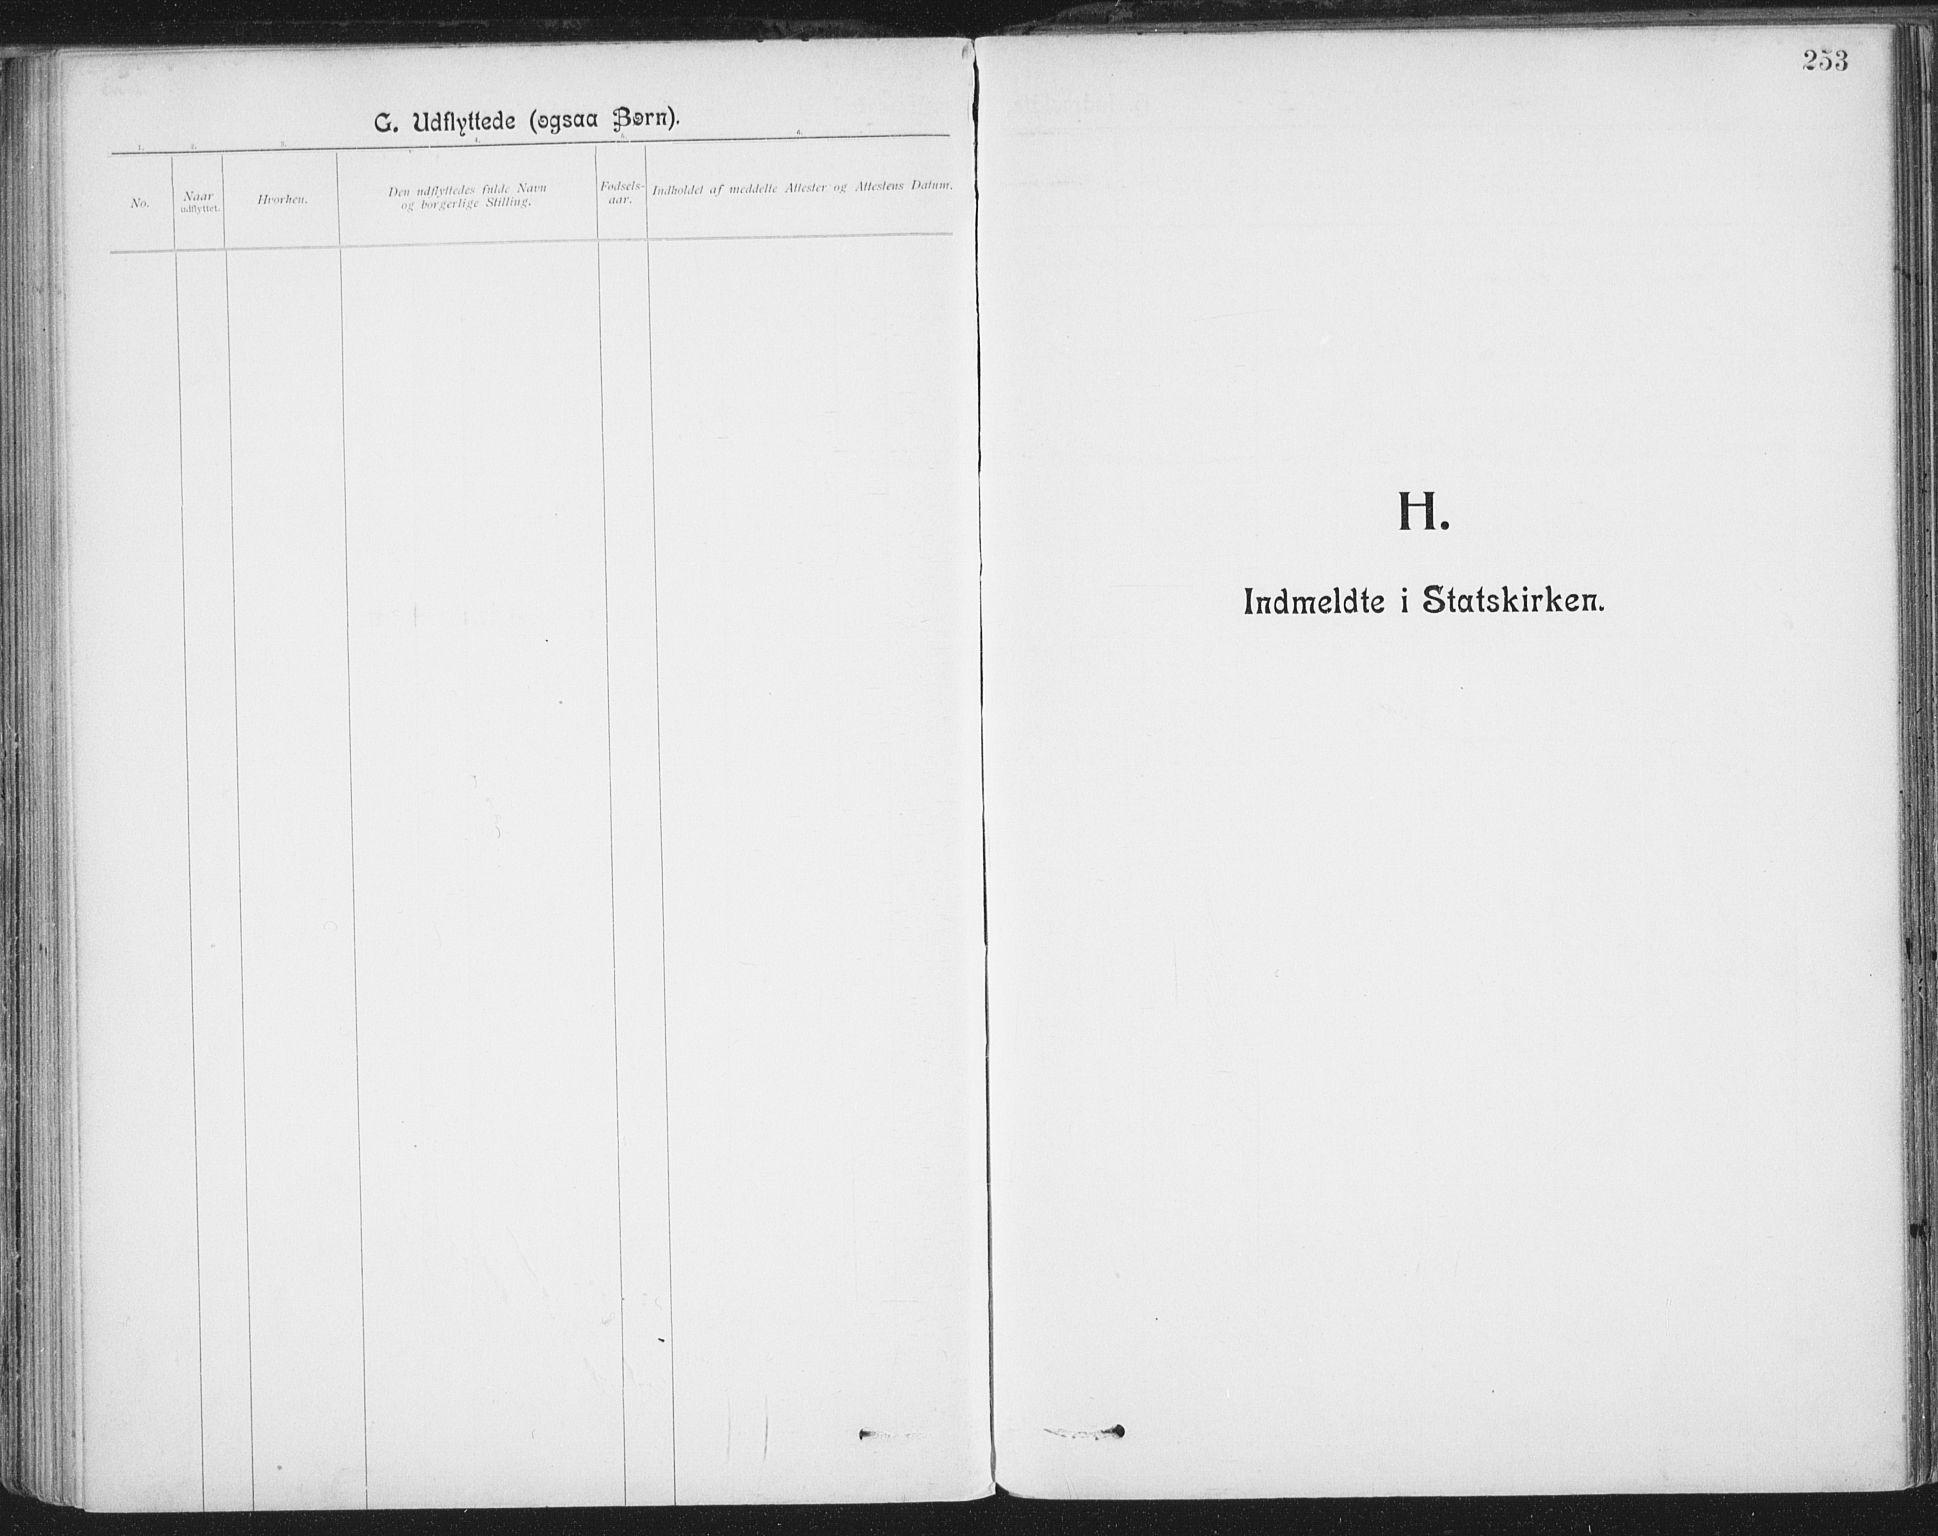 SAT, Ministerialprotokoller, klokkerbøker og fødselsregistre - Nordland, 801/L0012: Ministerialbok nr. 801A12, 1900-1916, s. 253